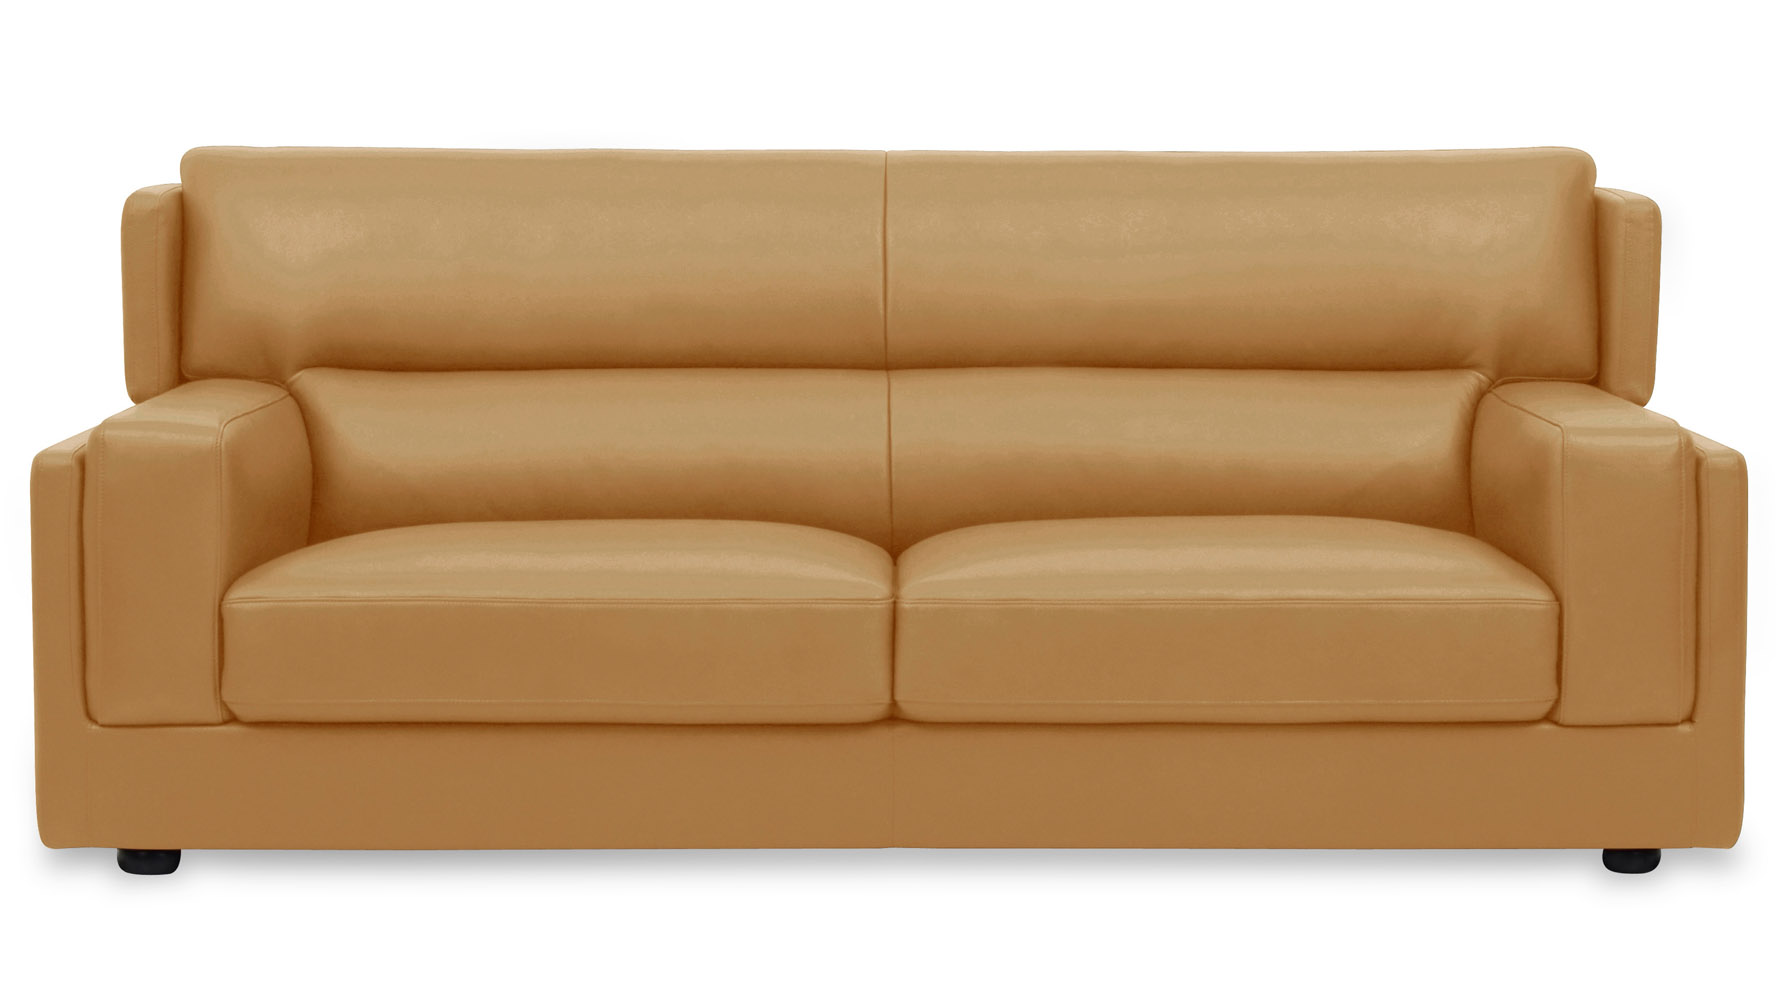 Genial Destin 3 Piece Butterscotch Leather Sofa Set With Armchair | Zuri Furniture